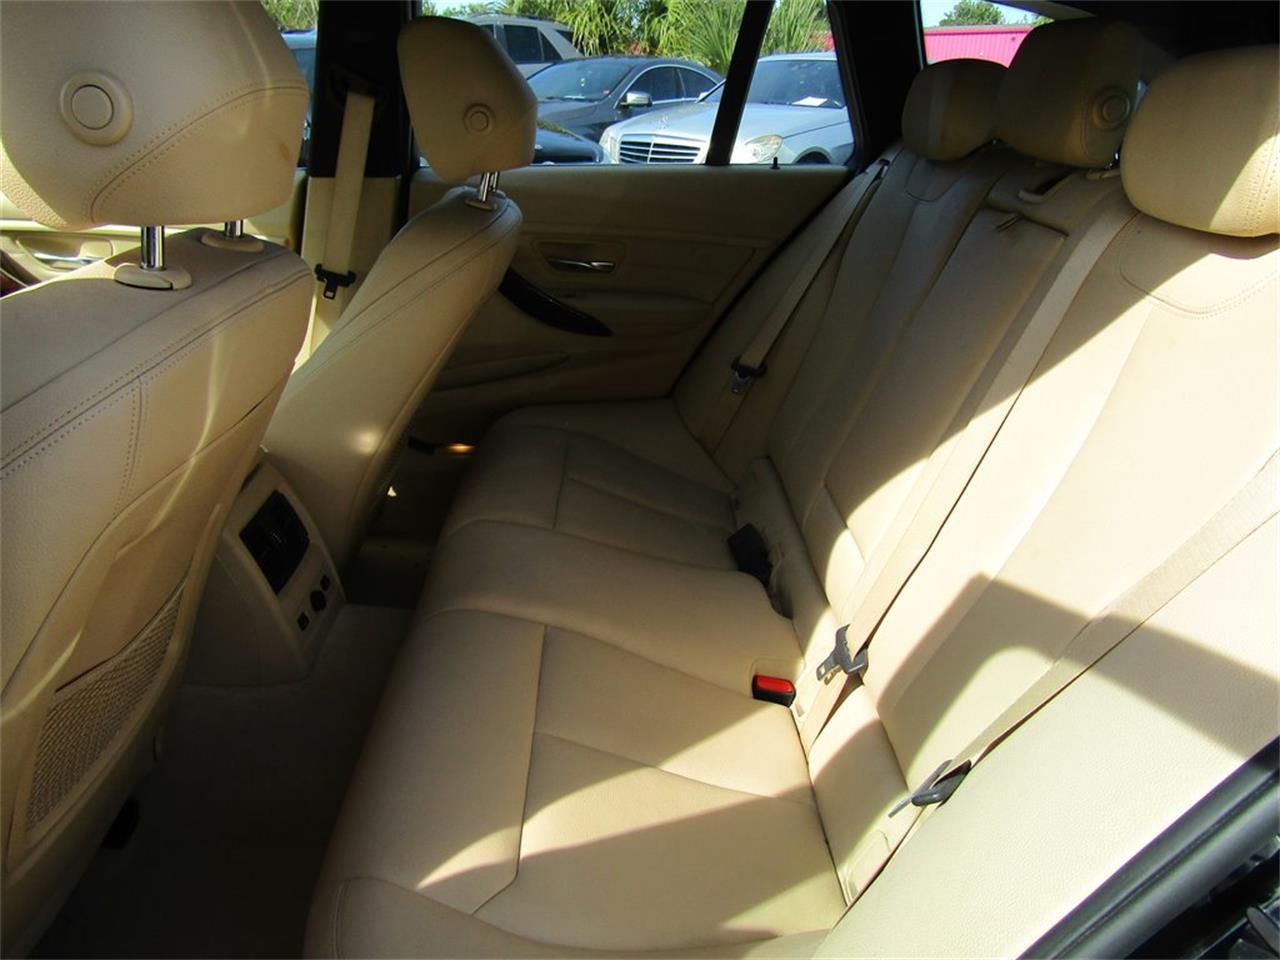 2015 BMW 3 Series (CC-1302087) for sale in Orlando, Florida